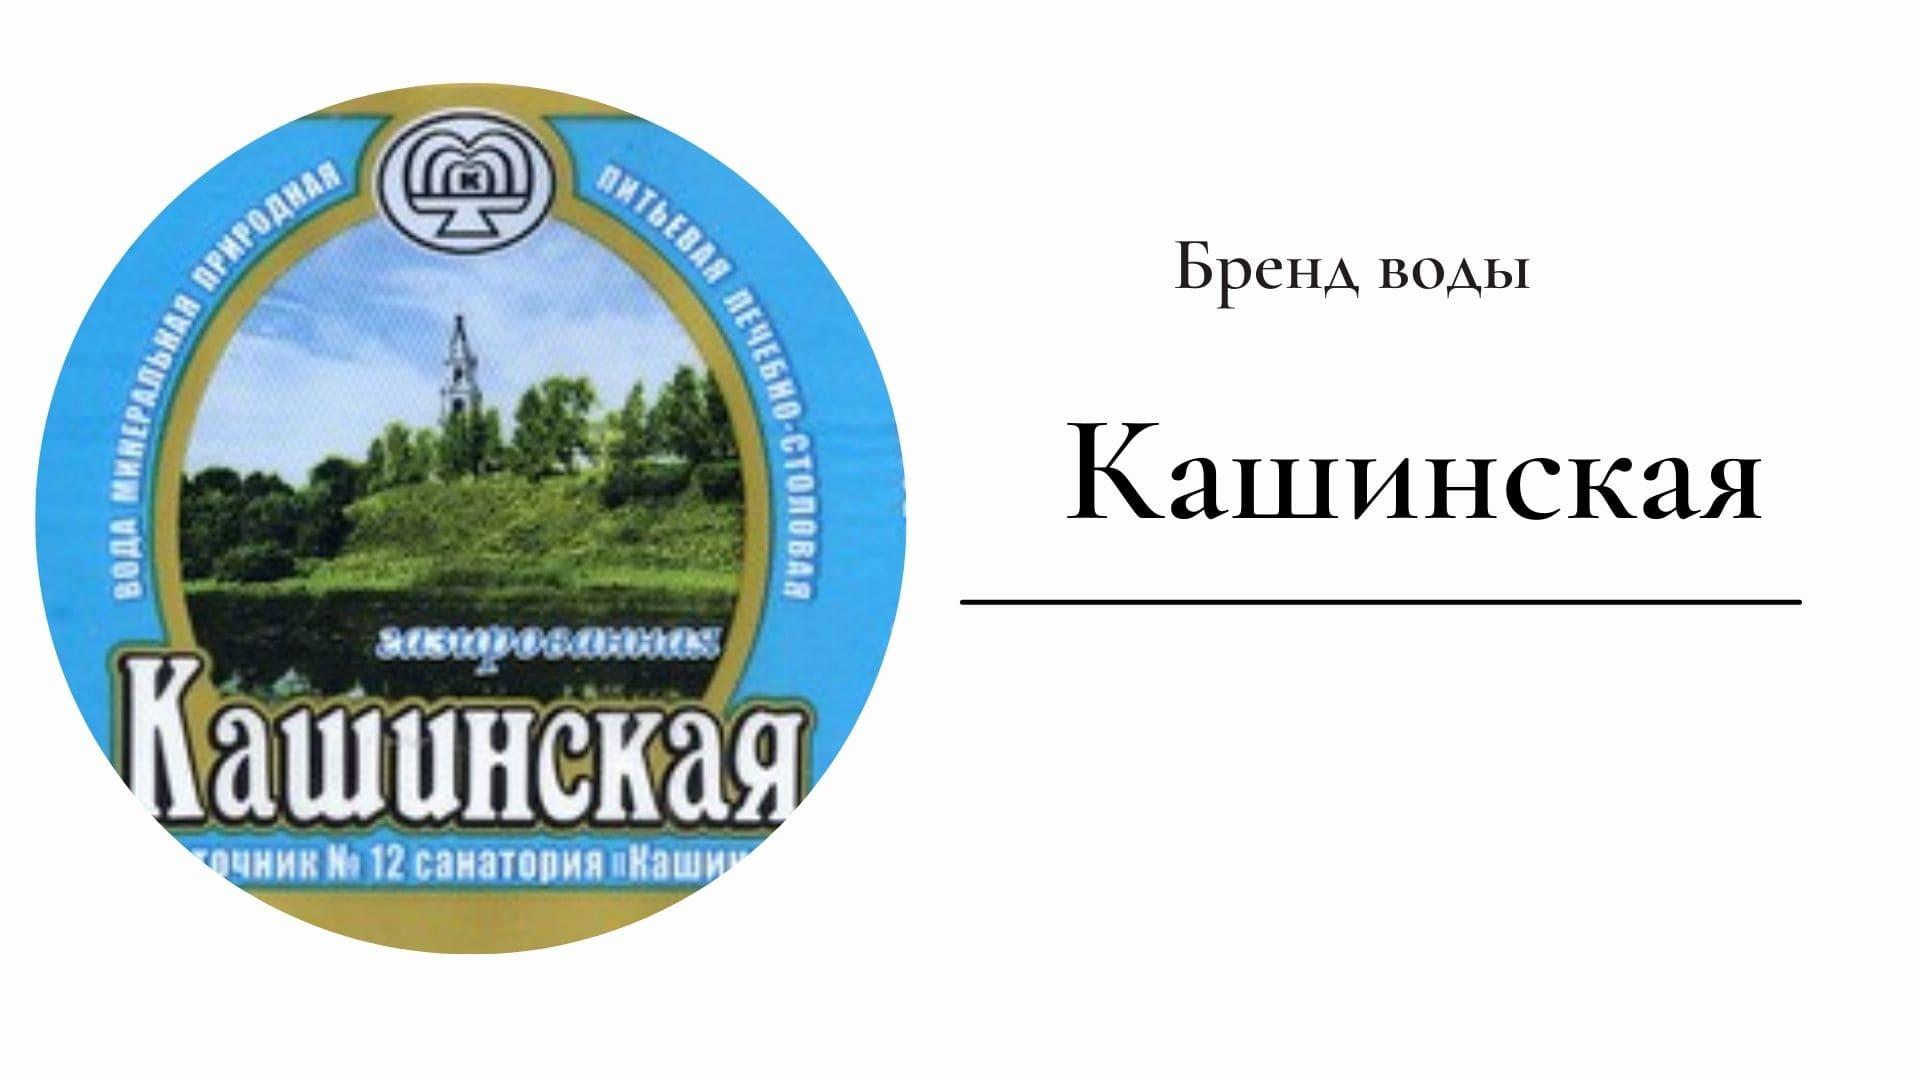 Бренд Кашинская